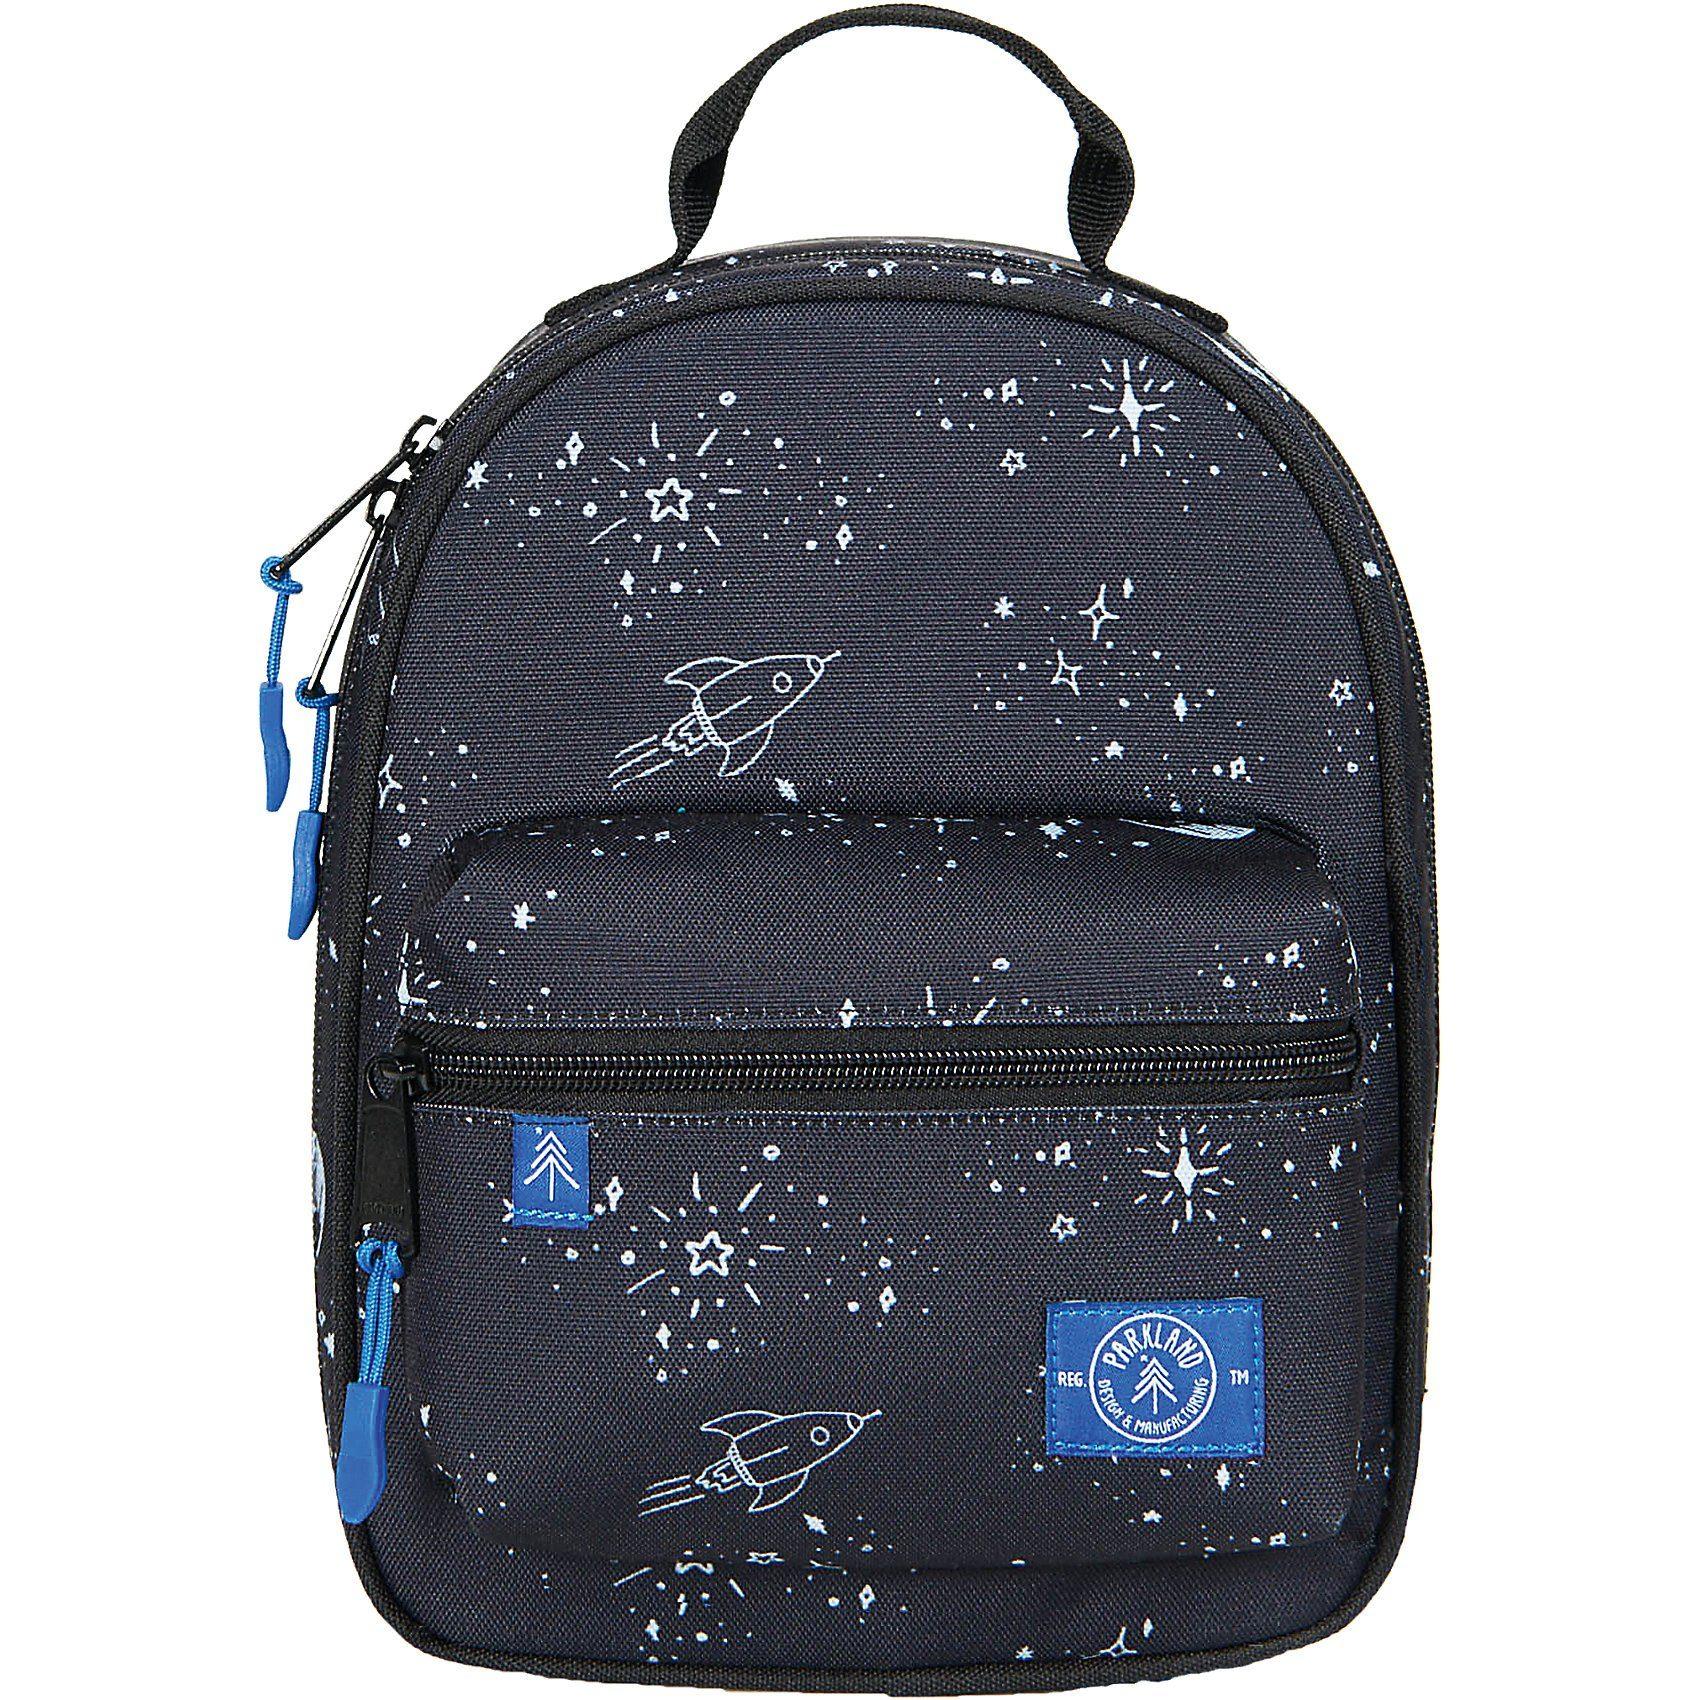 Unisex PARKLAND Kühltasche Lunch Bag THE RODEO Space Dreams schwarz | 00828432132430